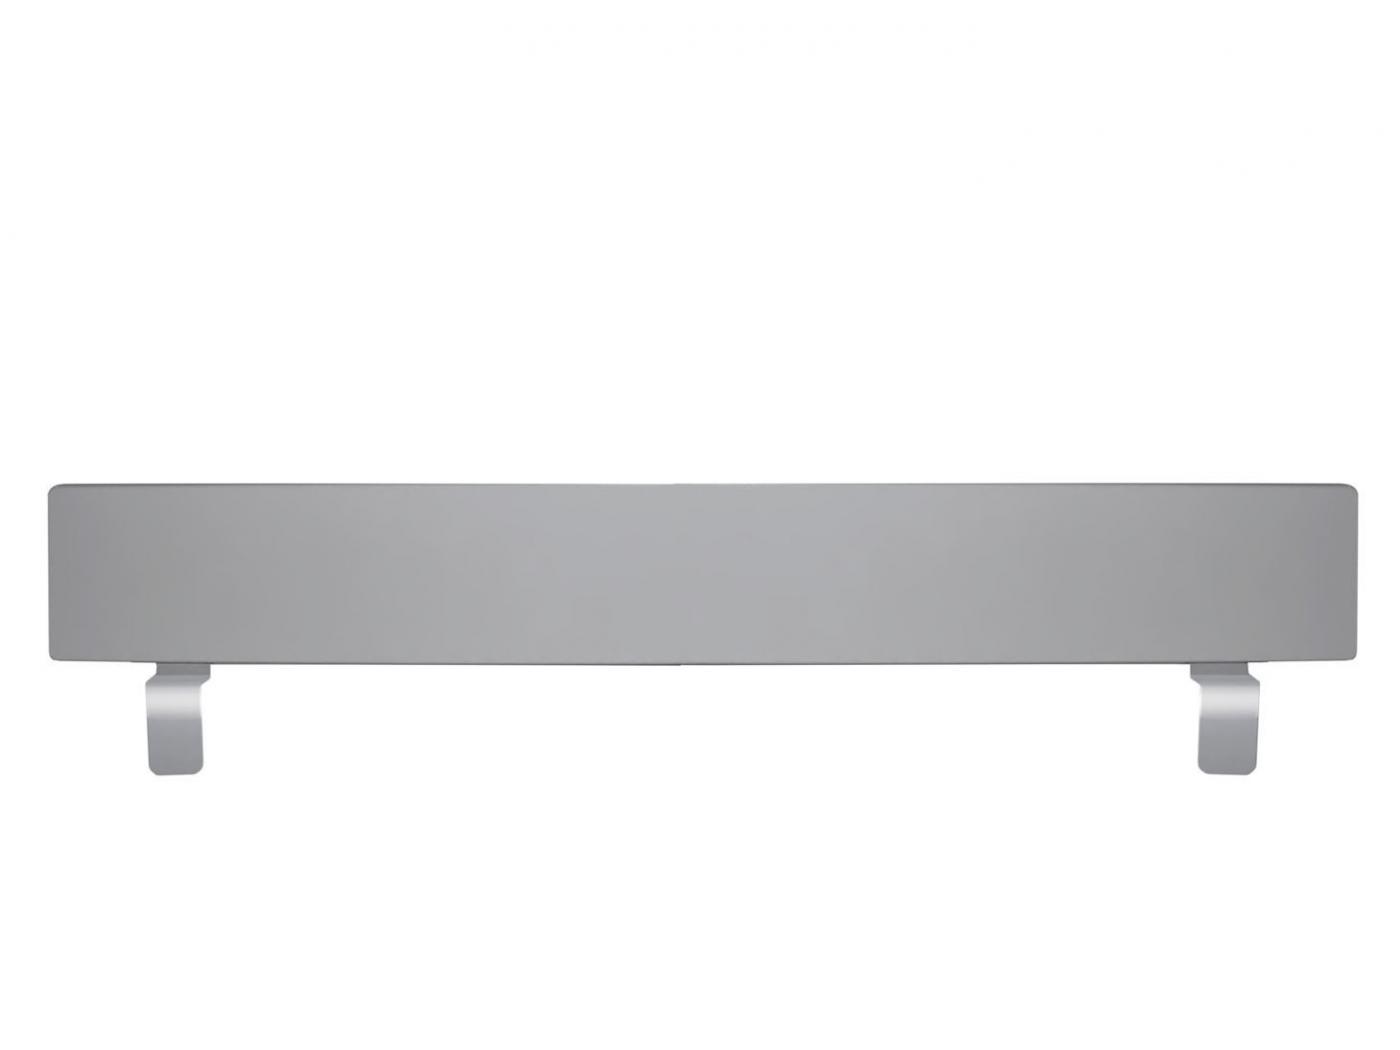 bopita barre de protection universelle gris pure. Black Bedroom Furniture Sets. Home Design Ideas